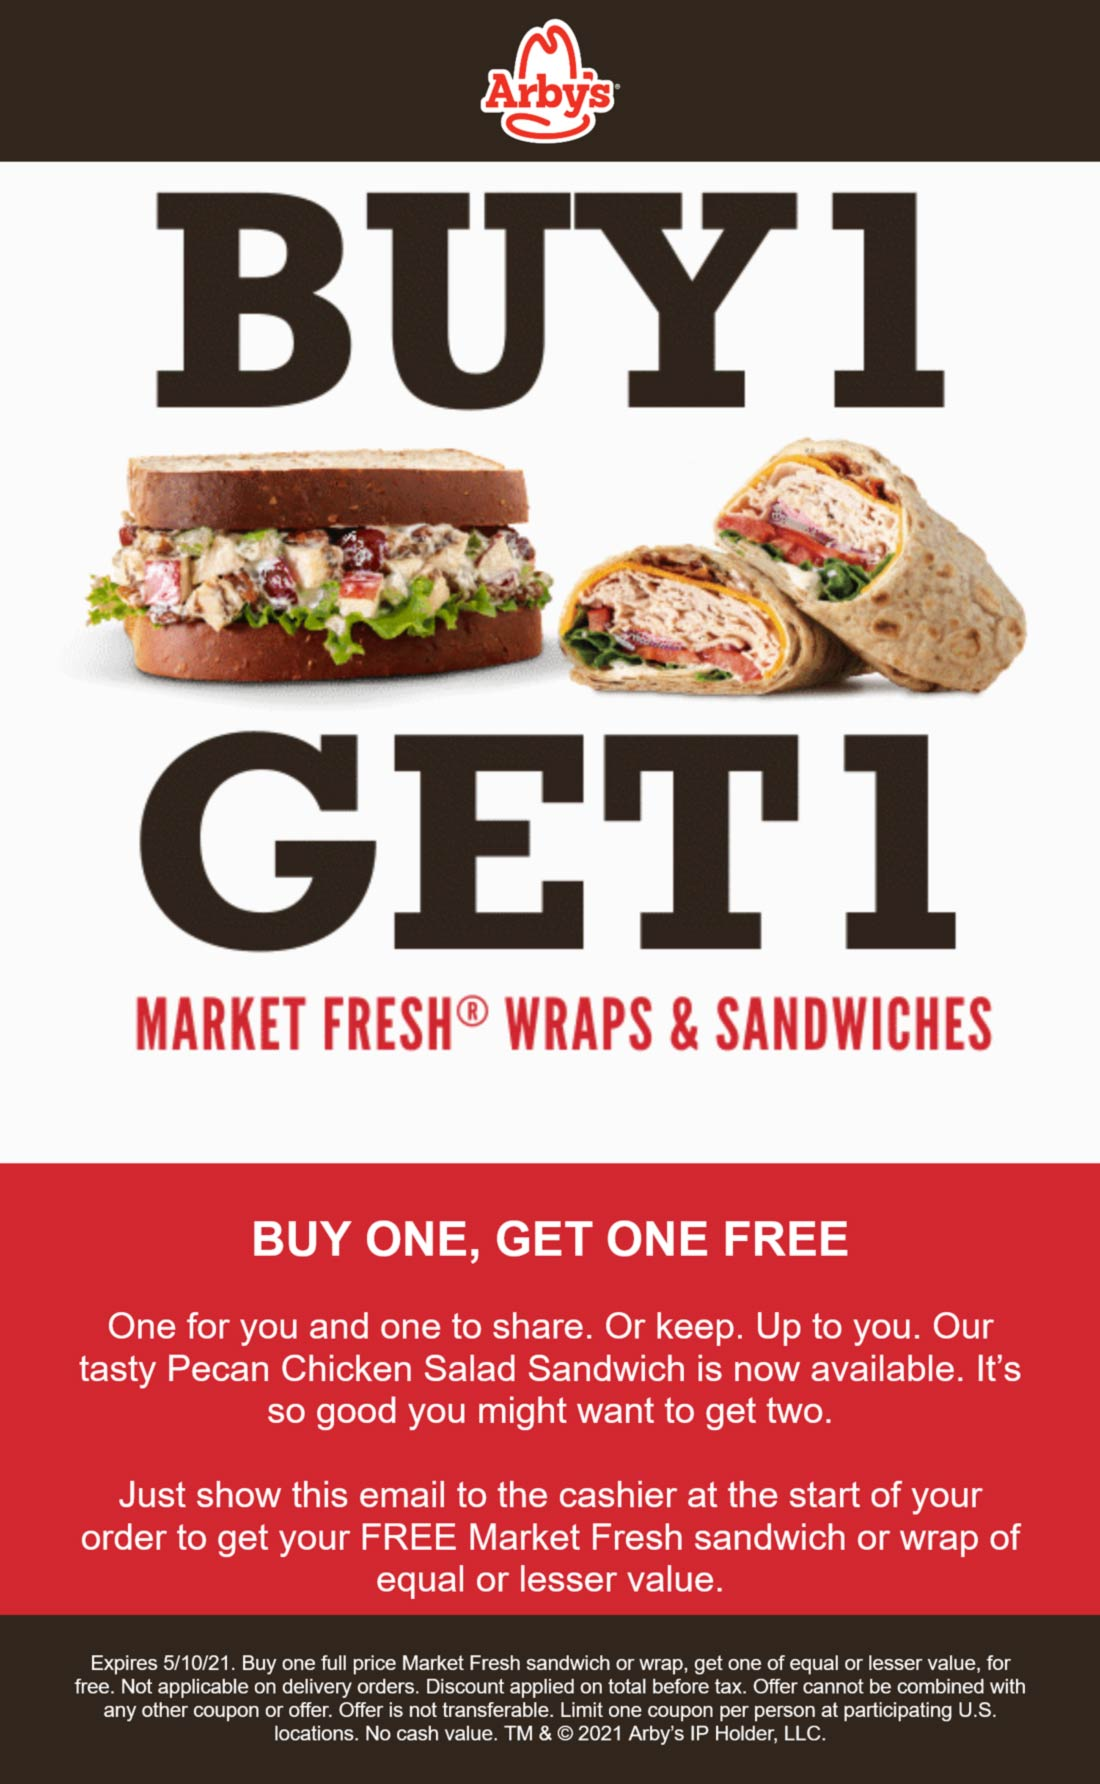 Arbys restaurants Coupon  Second market fresh sandwich or wrap free at Arbys #arbys